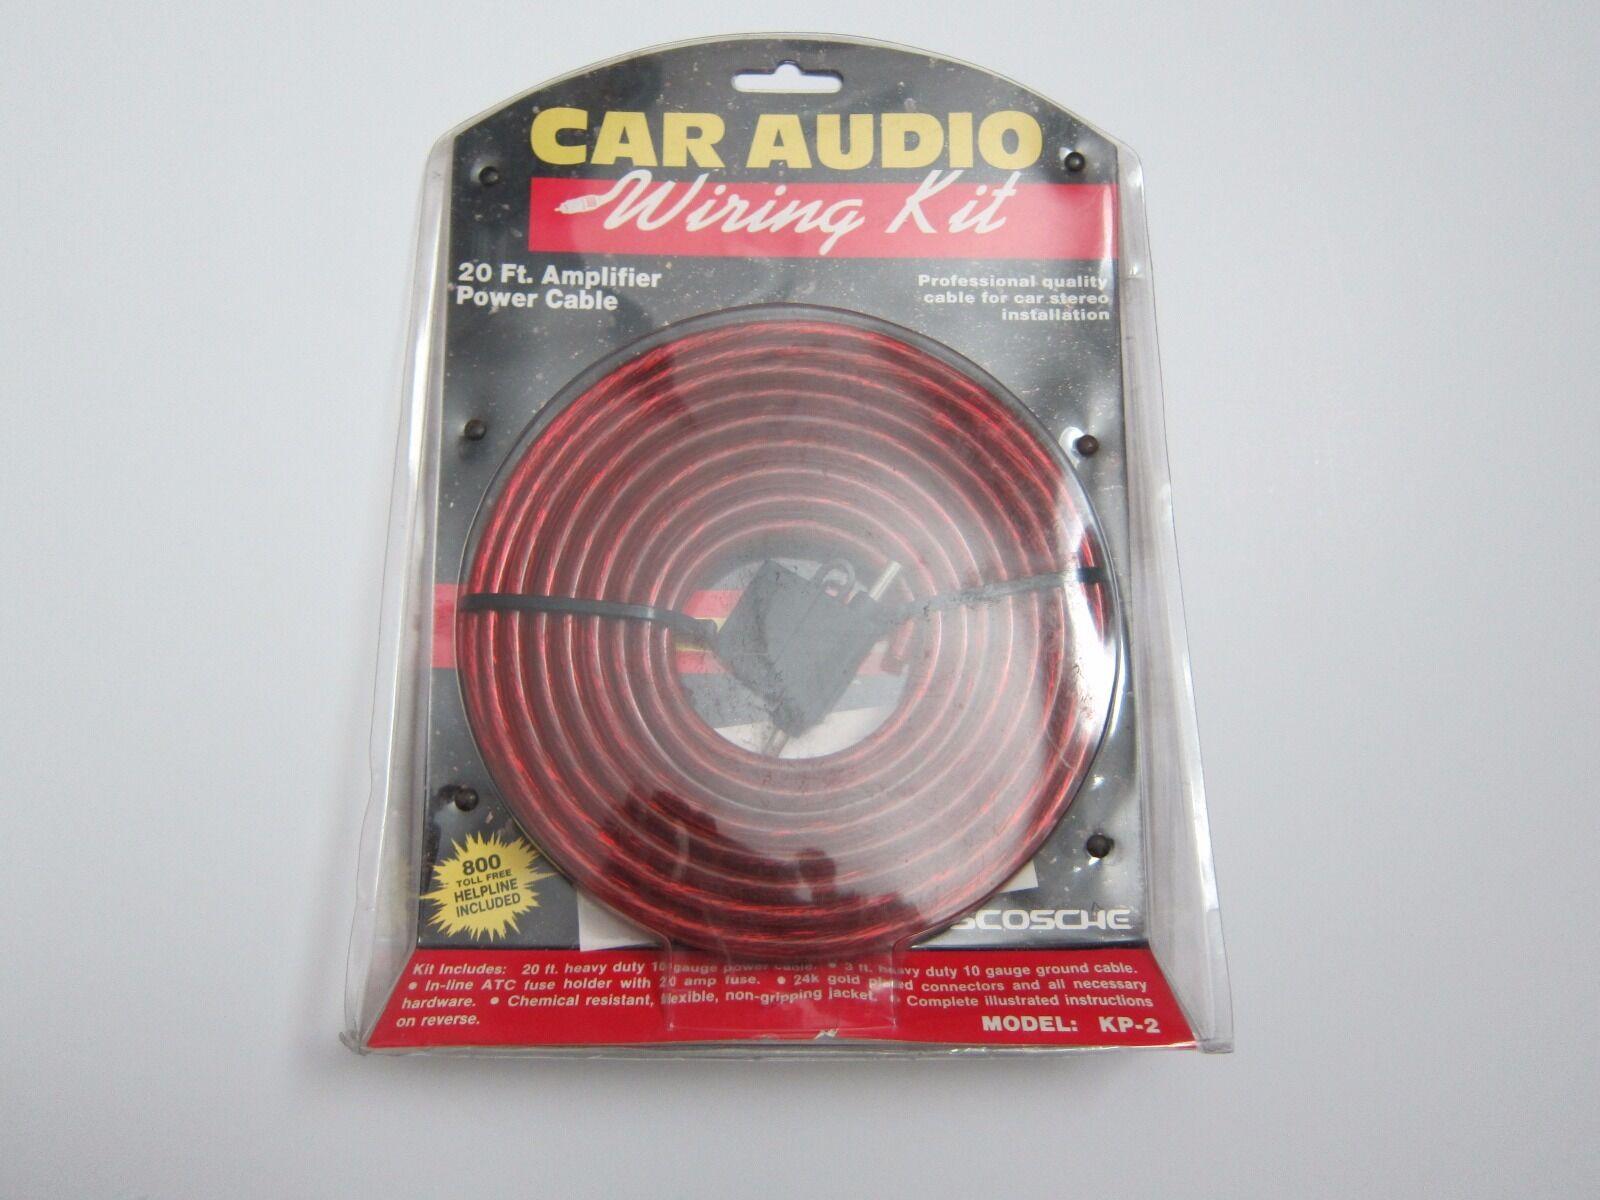 Scosche Kp 2 20 Feet Amplifier Car Audio Wiring Kit Ebay Gauge High Quality Lifier Power Wire Norton Secured Powered By Verisign